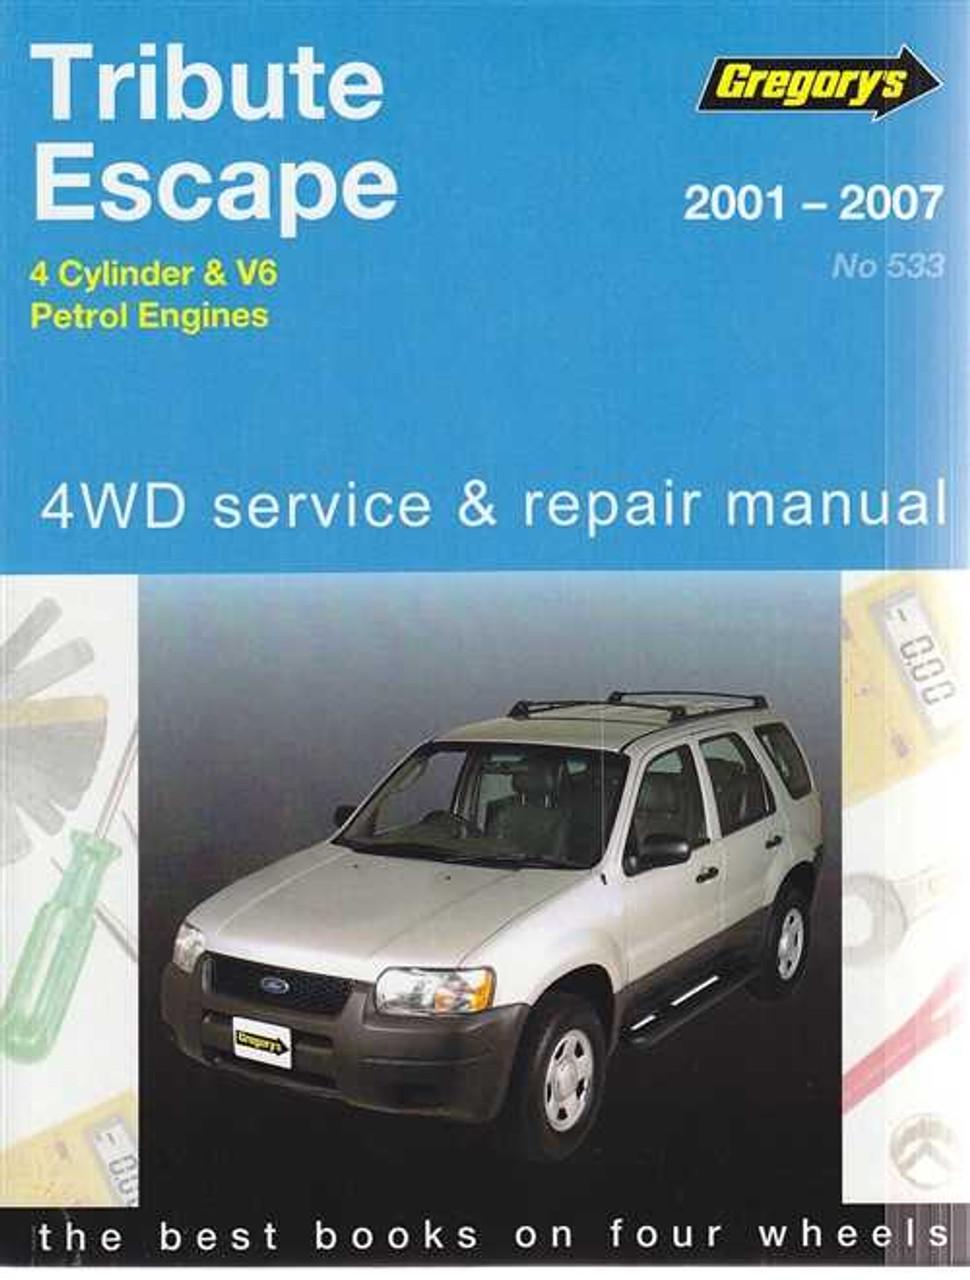 ford tribute and mazda escape petrol 2001 2007 workshop manual rh automotobookshop com au mazda tribute 2001 parts manual mazda tribute 2001 owners manual